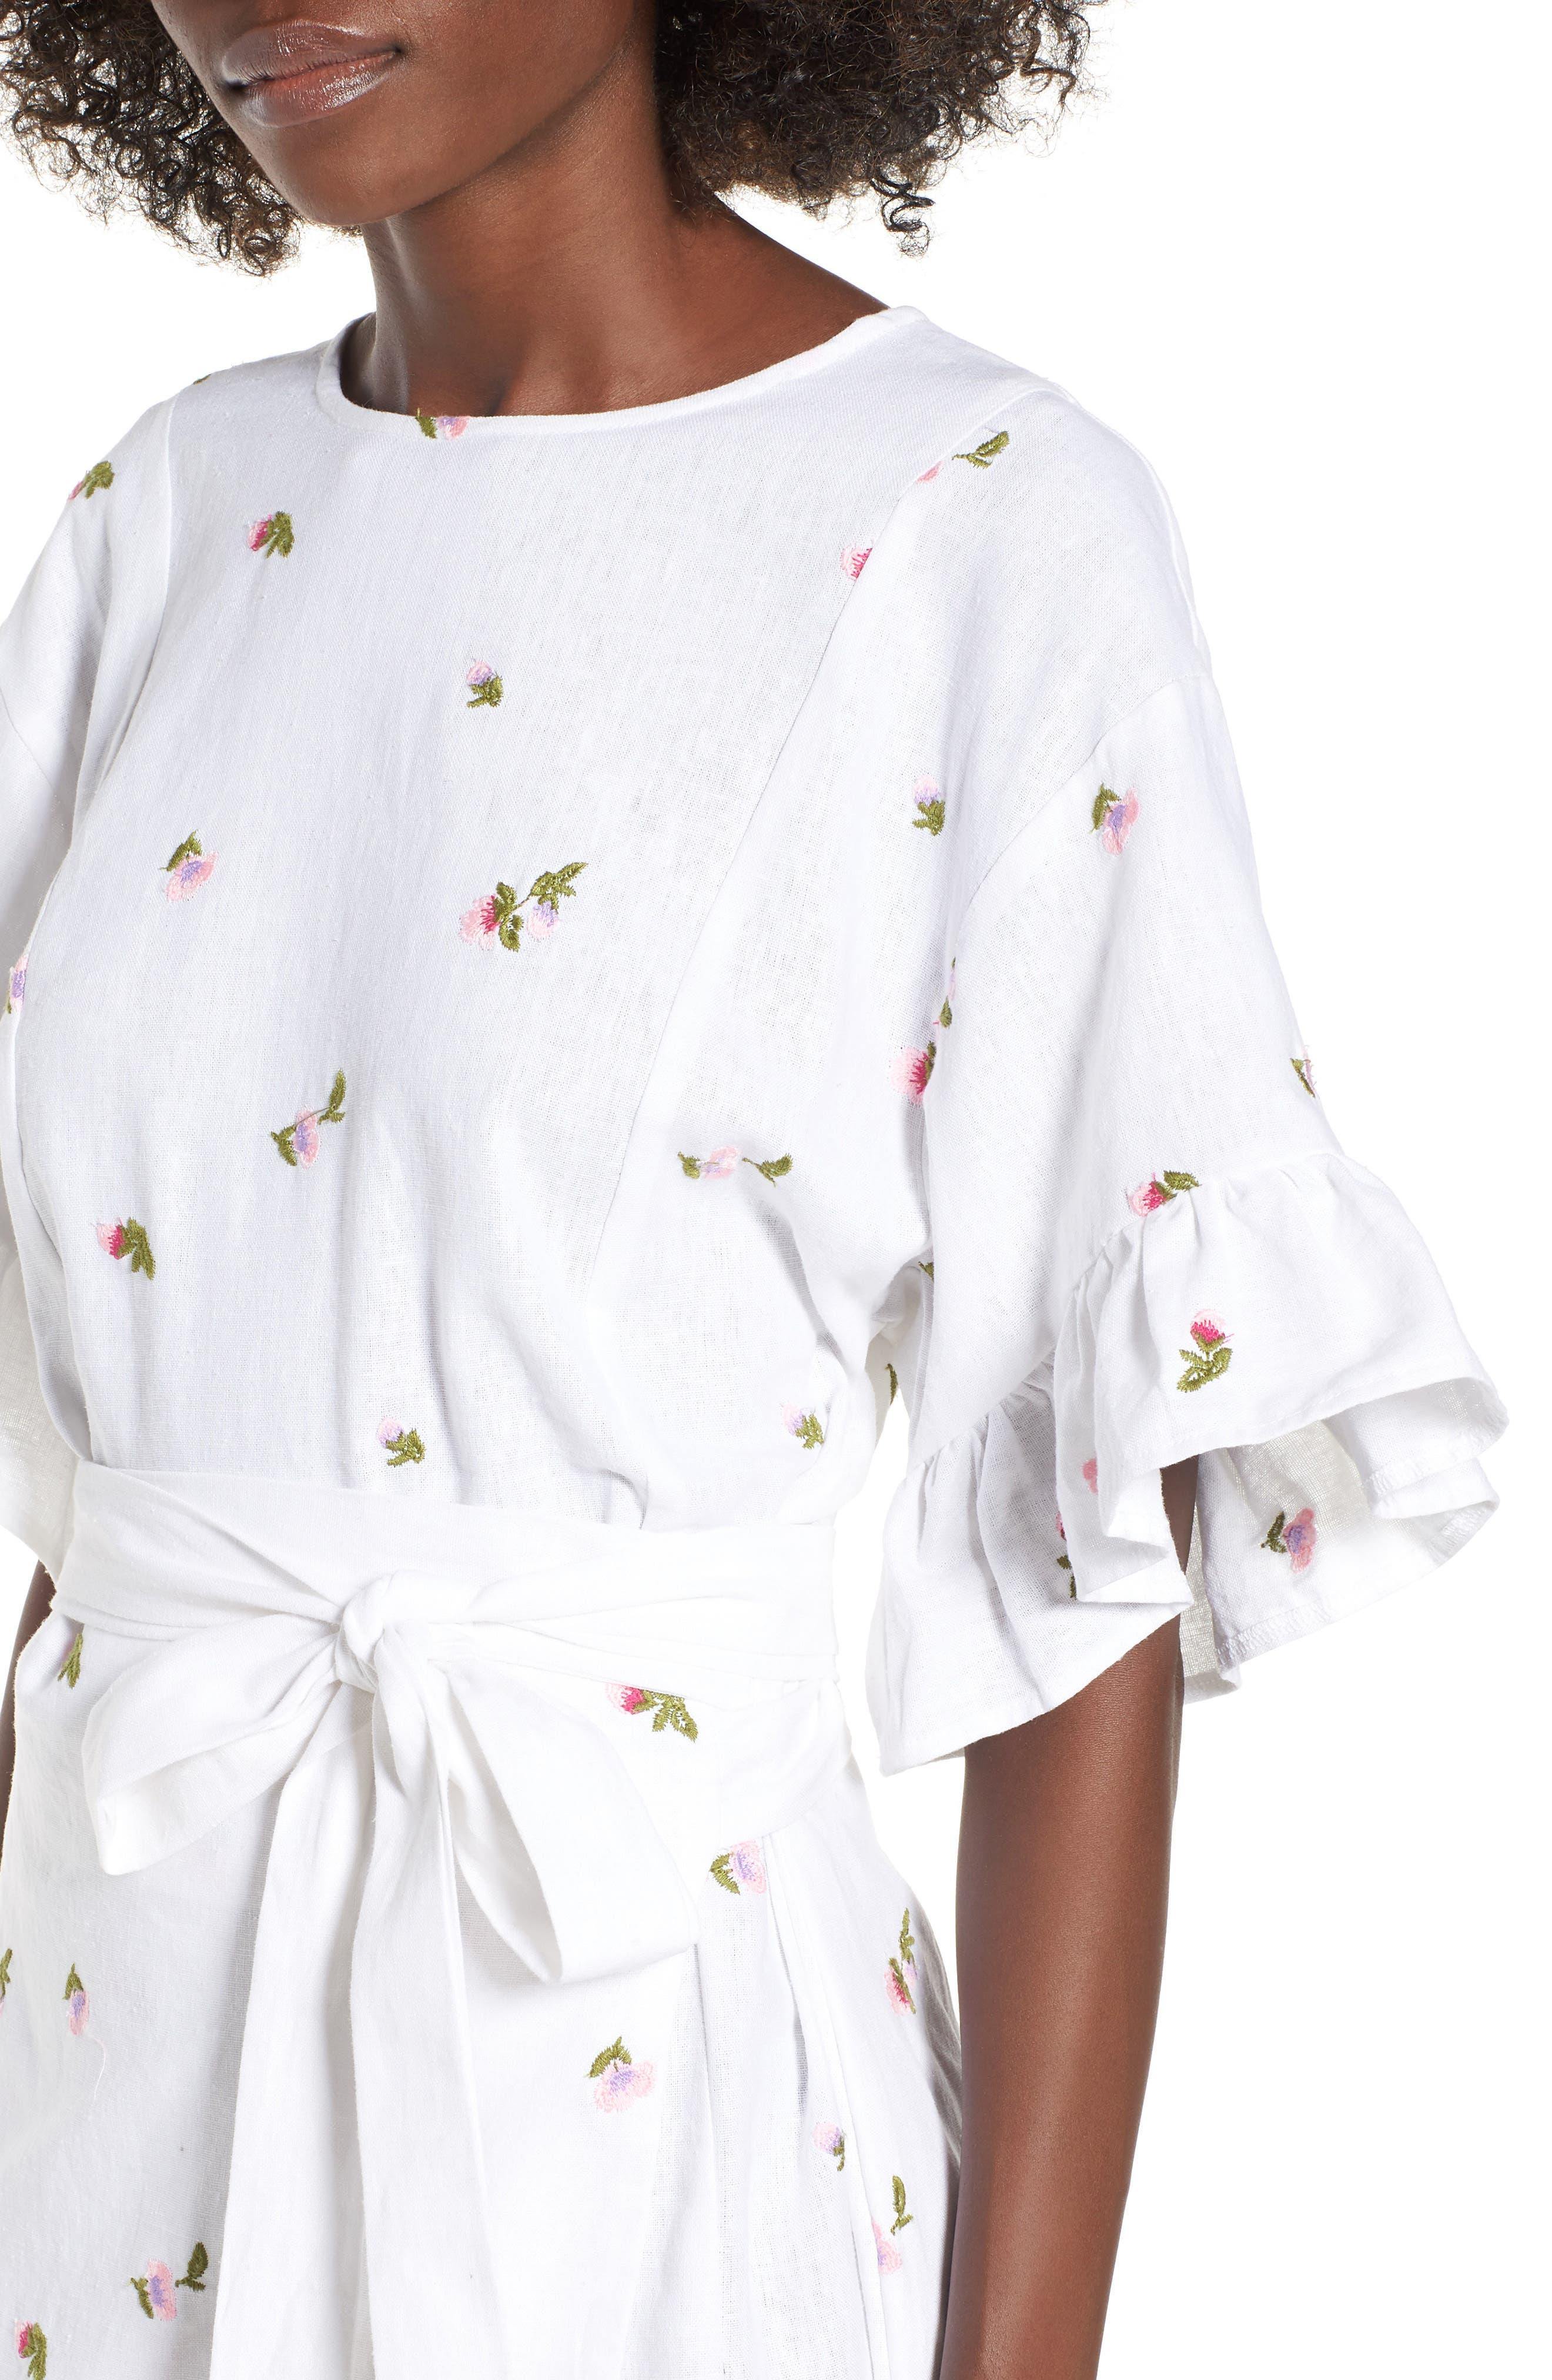 Tokyo Ruffle Sleeve Wrap Dress,                             Alternate thumbnail 4, color,                             DITSY EMBROIDERY